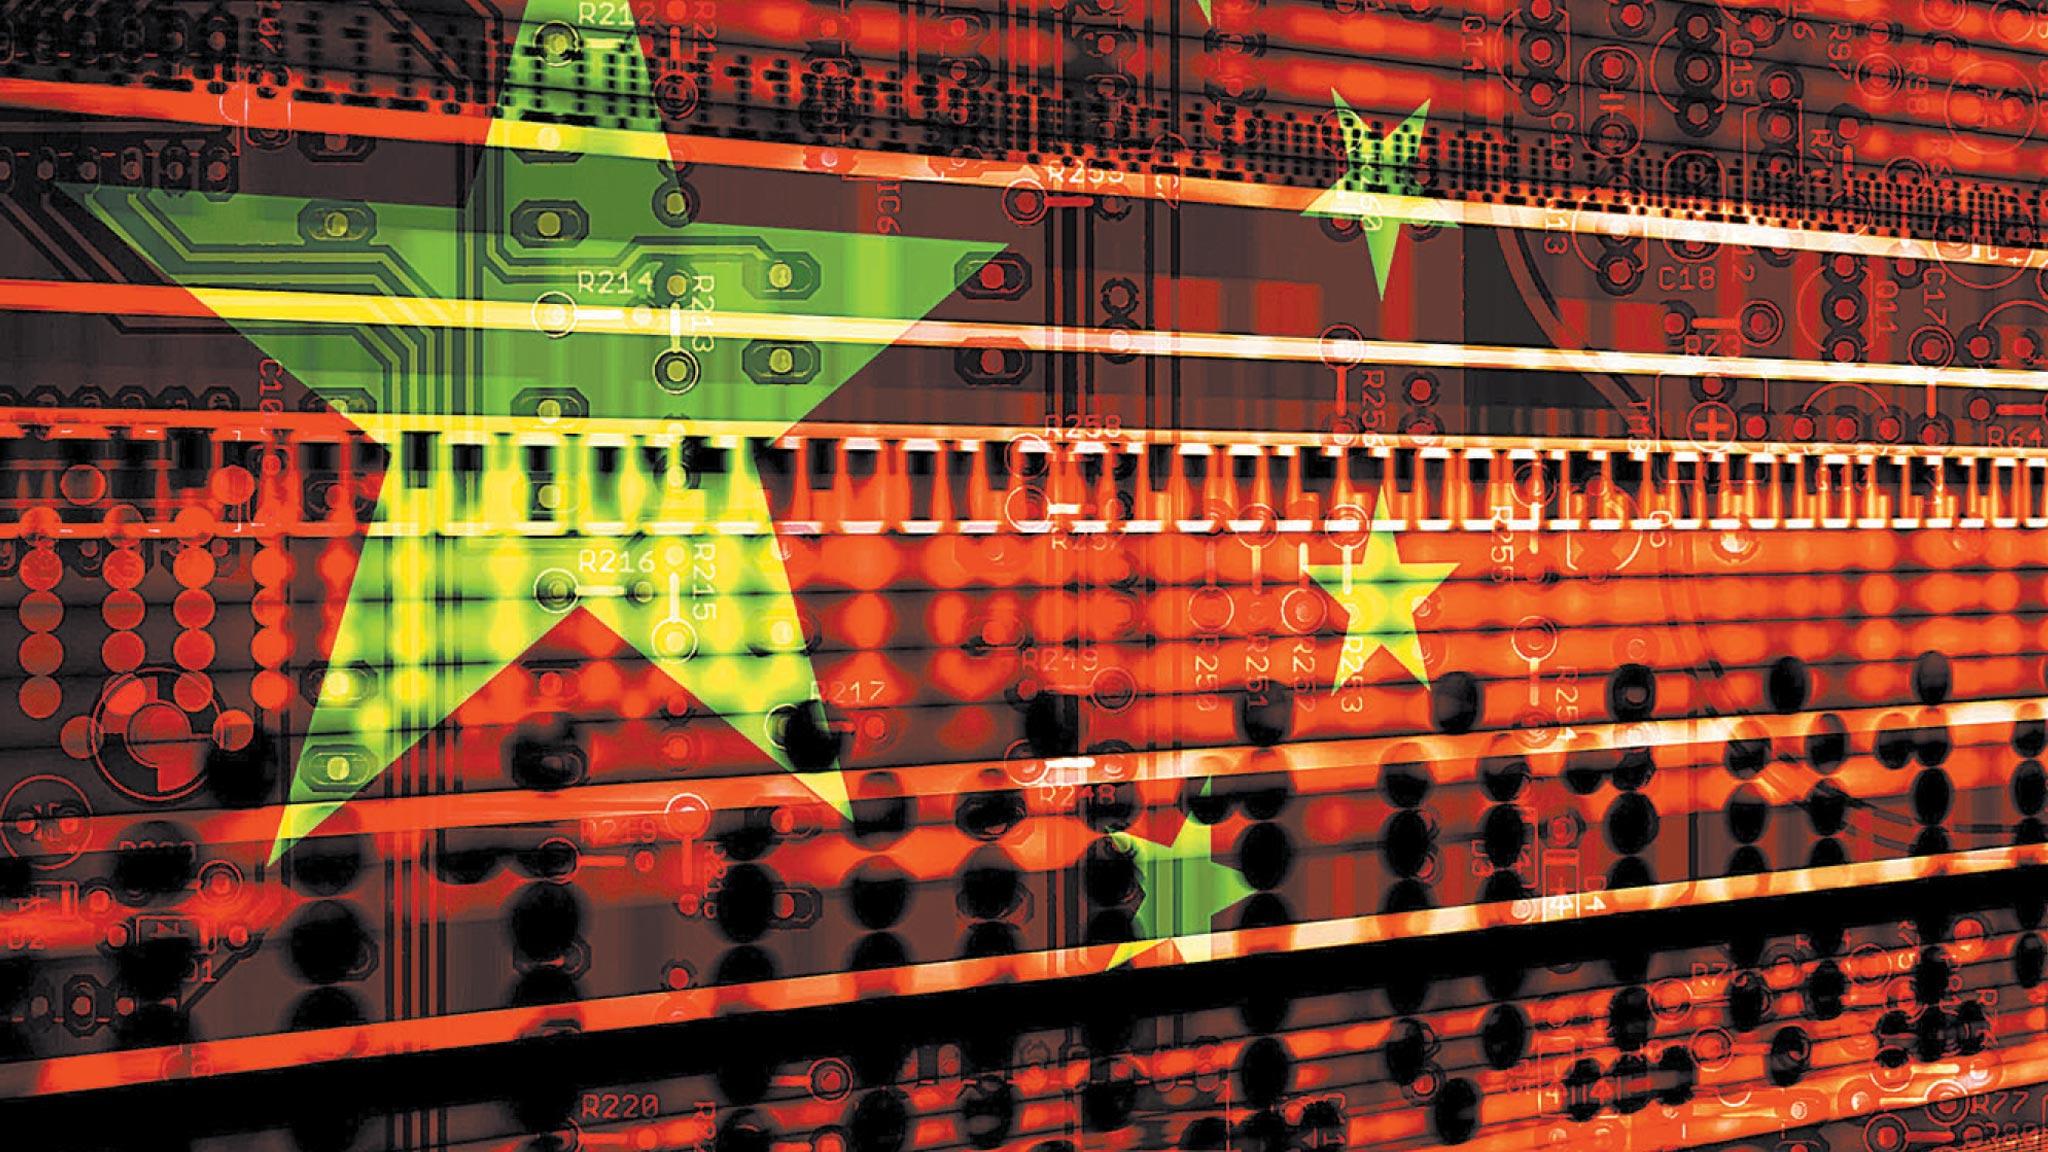 Western Nations Accuse China of Espionage